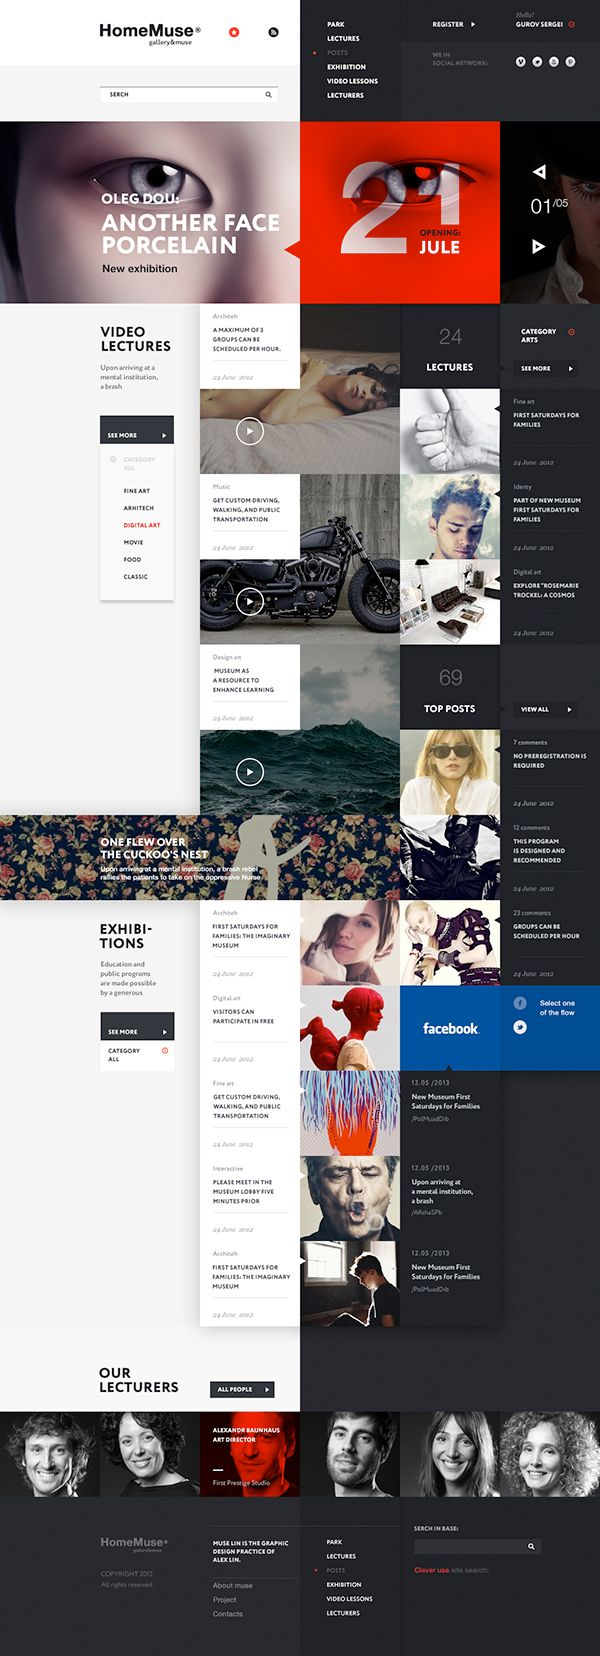 Infographics Ui Design Et Web Design: Web Design For Art Gallery & Museum HomeMuse